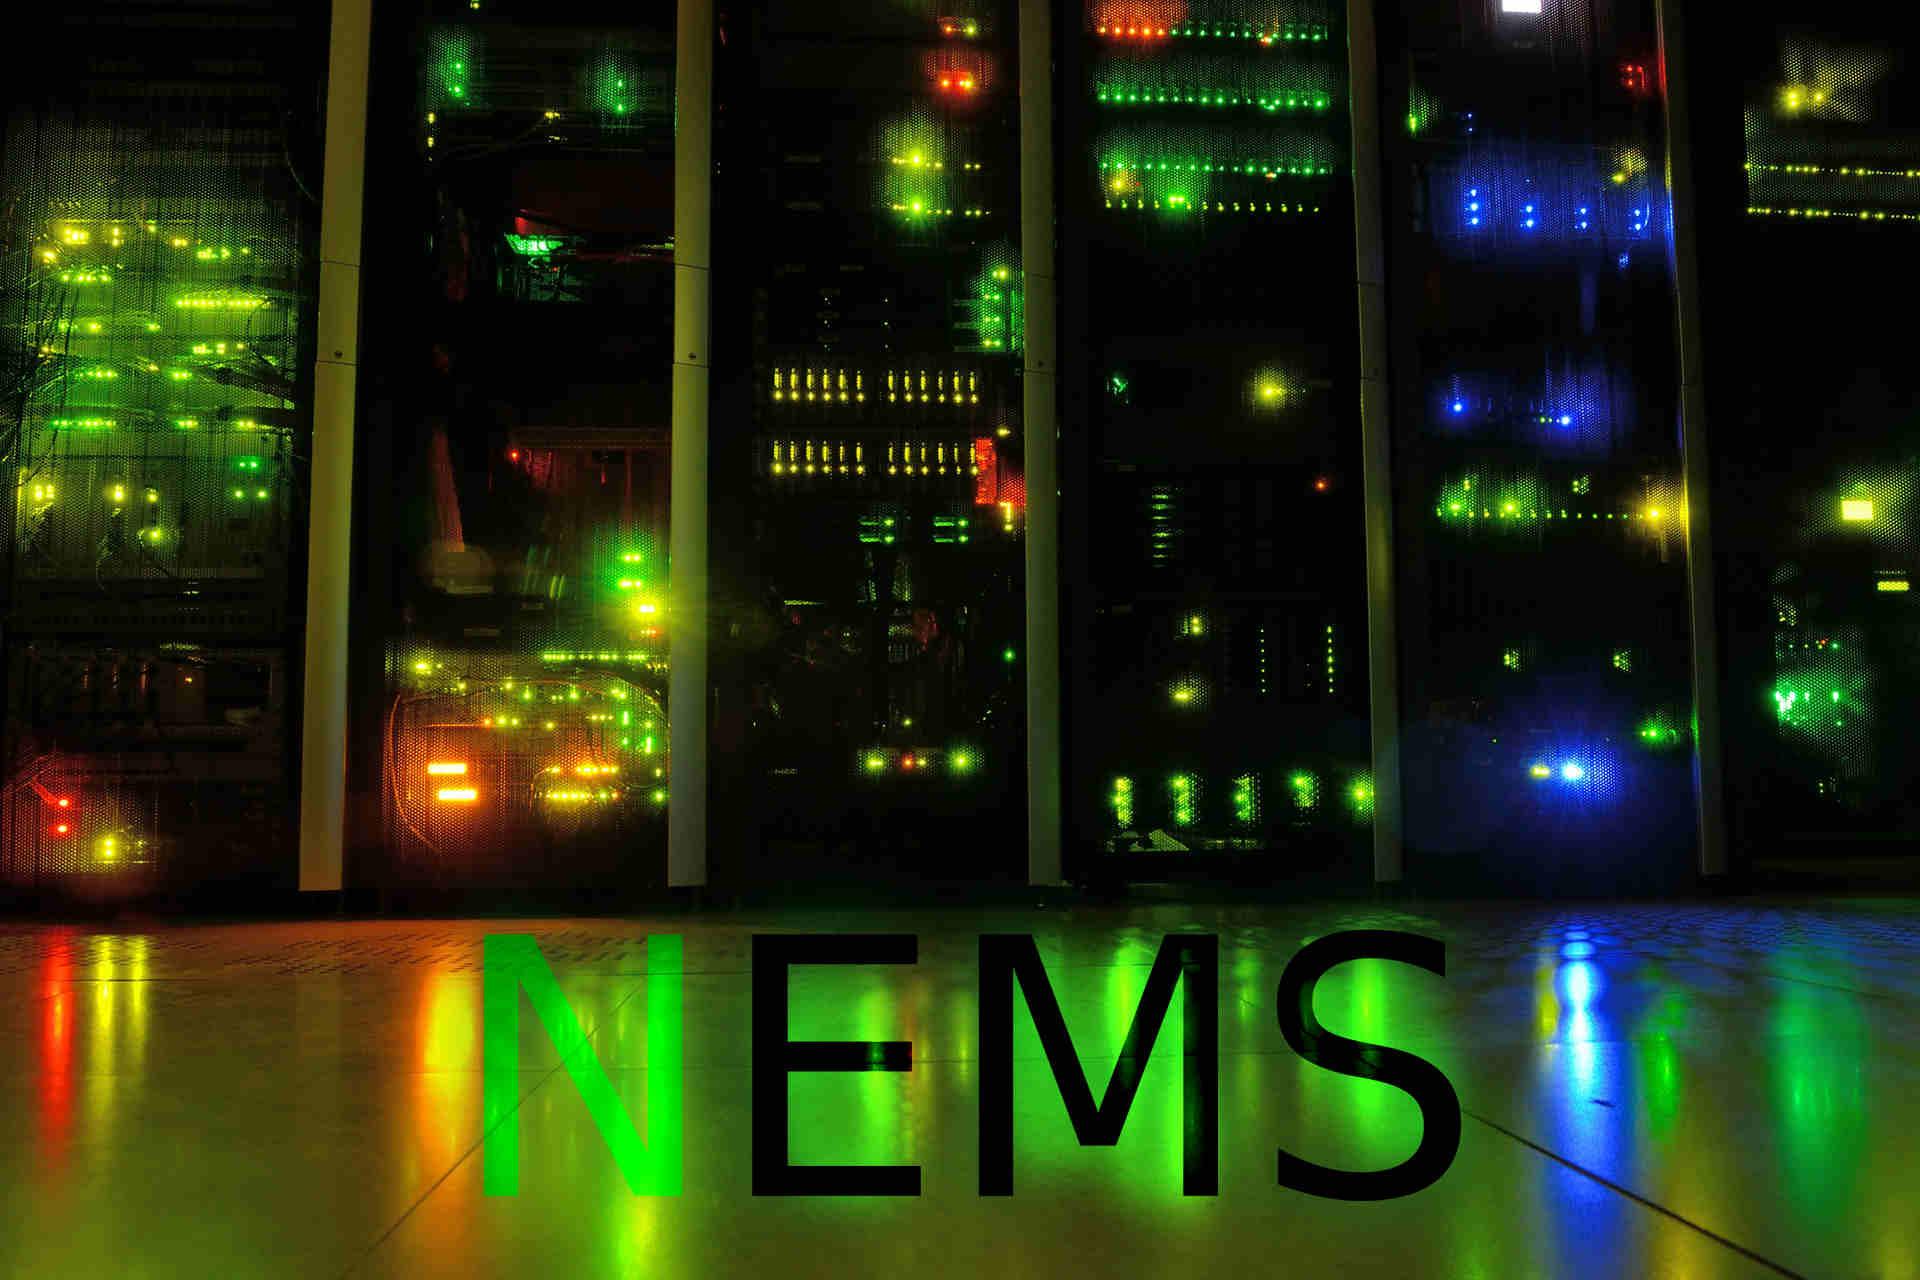 NEMS | Nagios Enterprise Monitoring Server